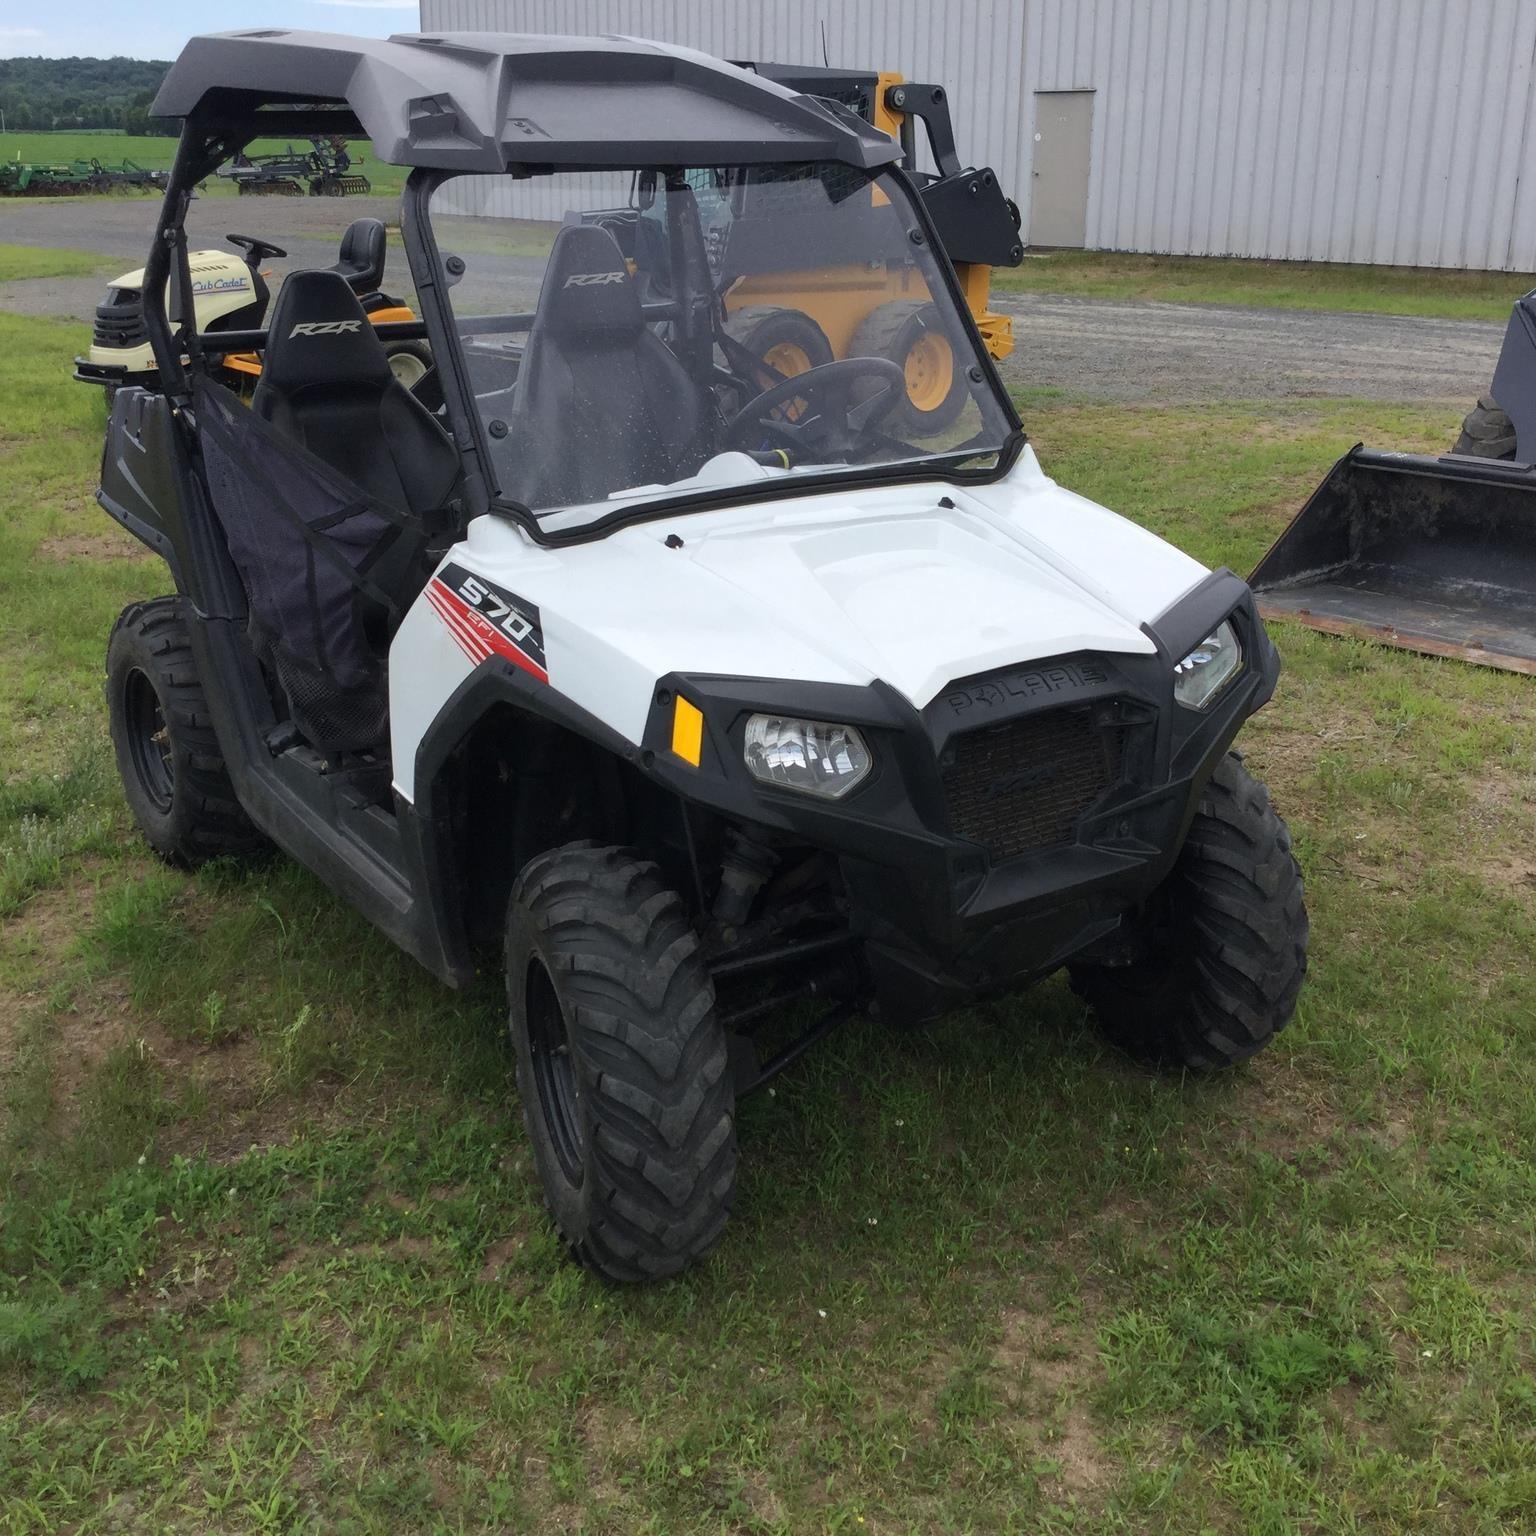 2015 Polaris Rzr >> 2015 Polaris Rzr 570 For Sale In Osceola Wisconsin